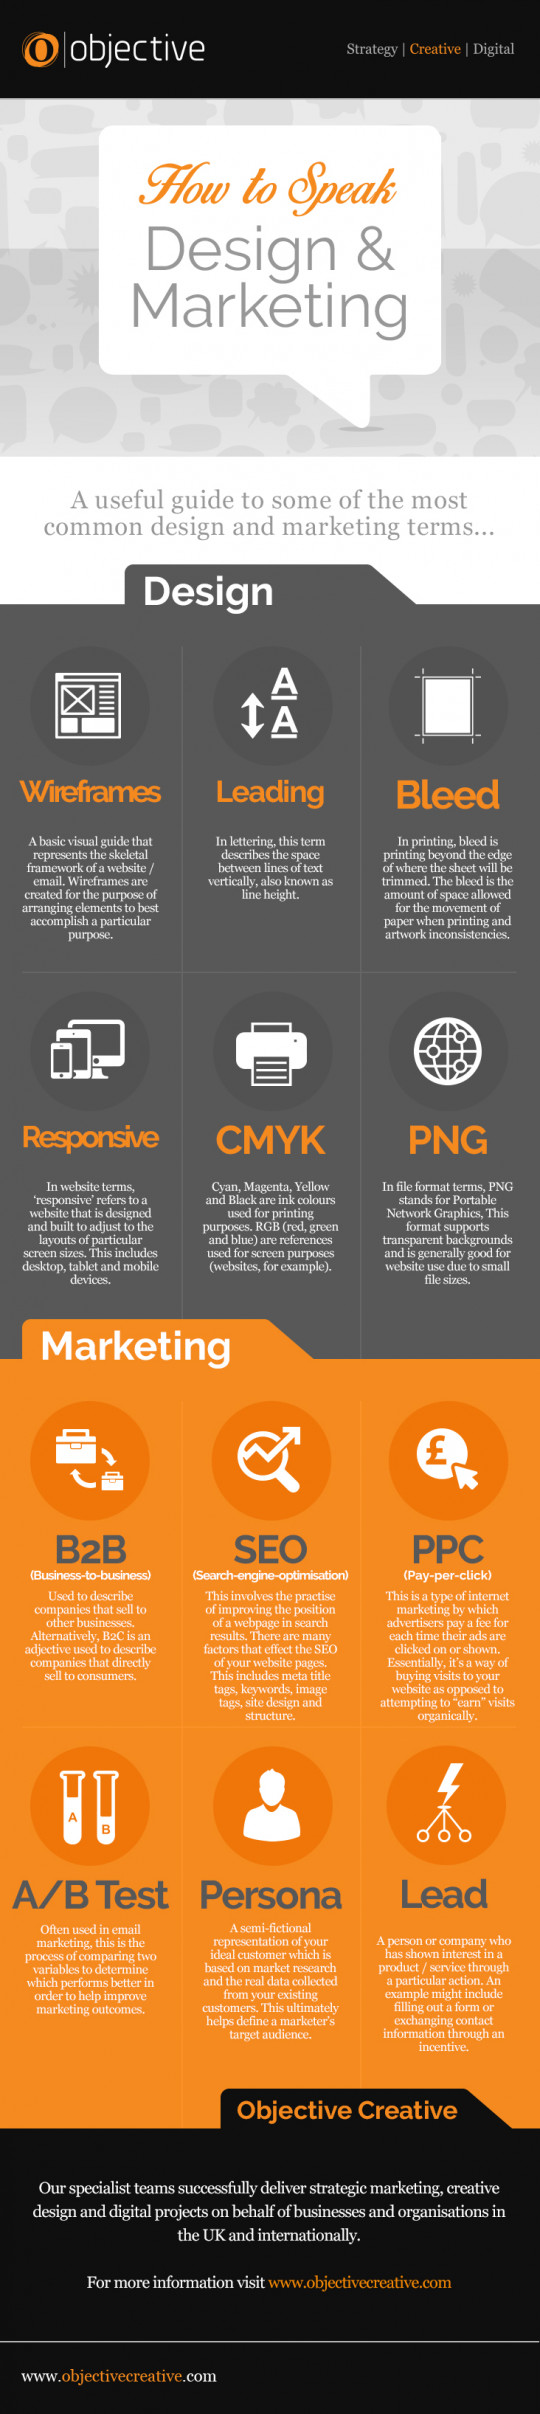 How to Speak Design & Marketing